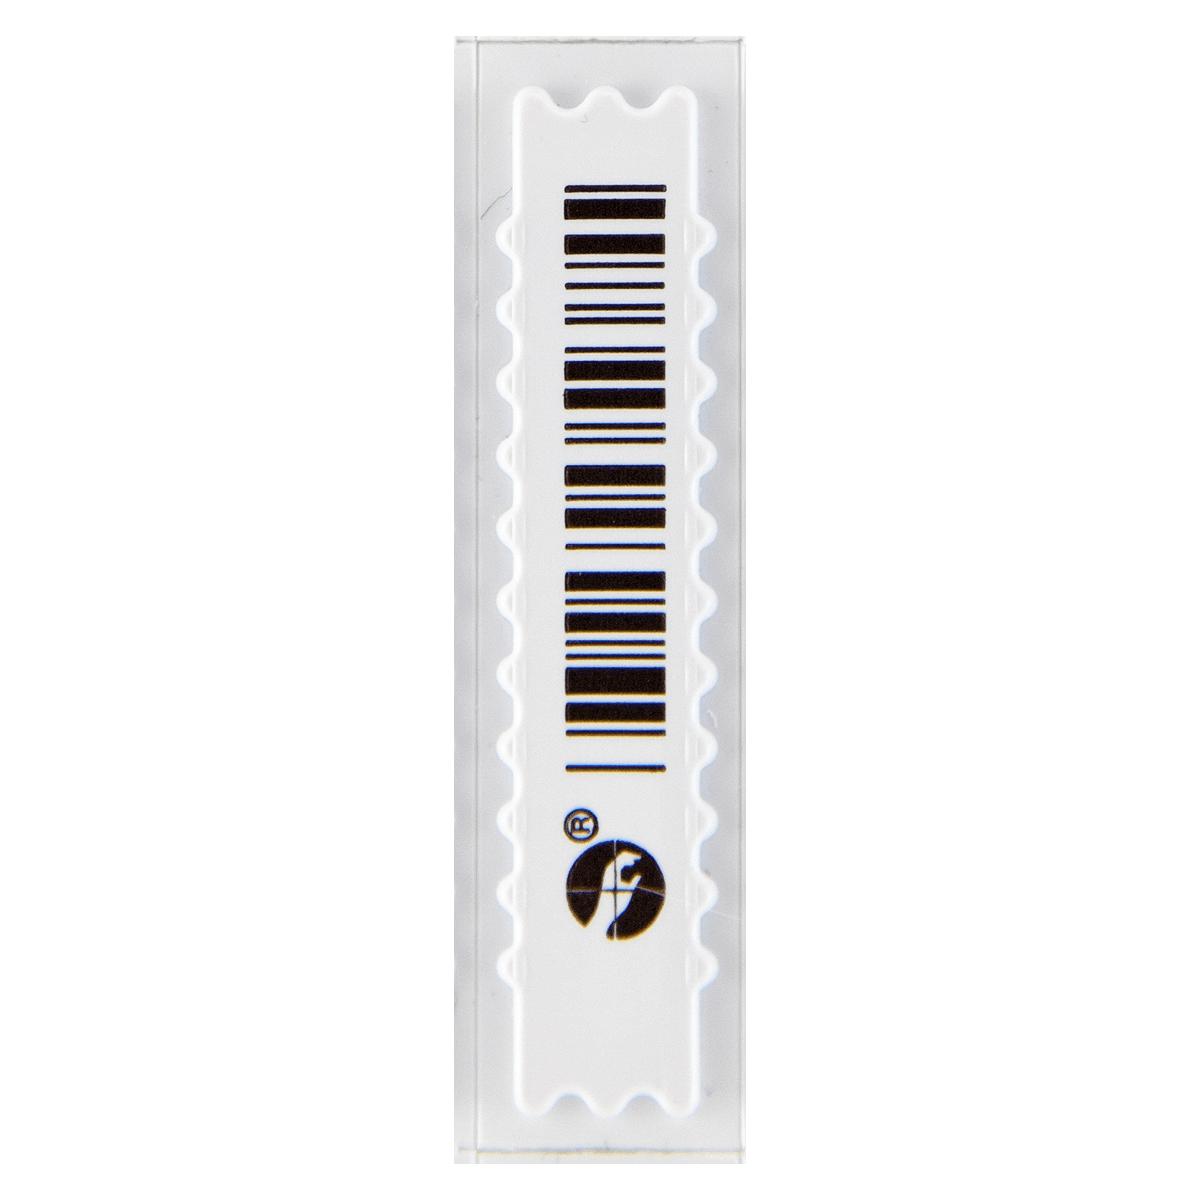 Etiquettes Sensormatic AM AP